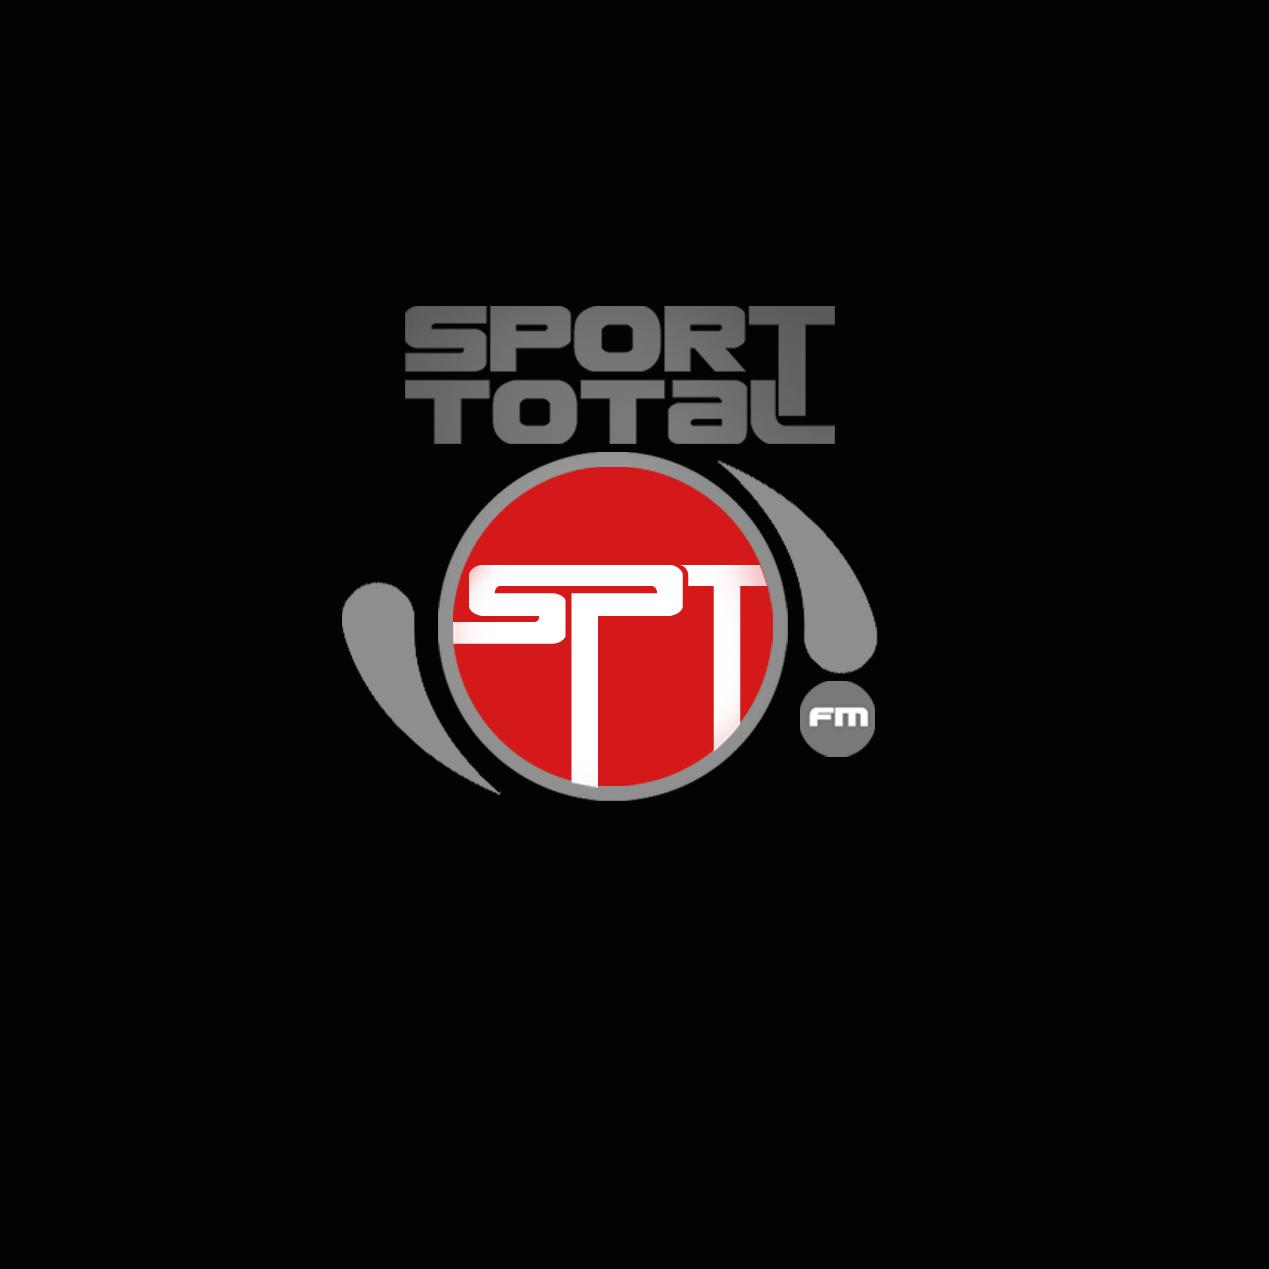 sport-total